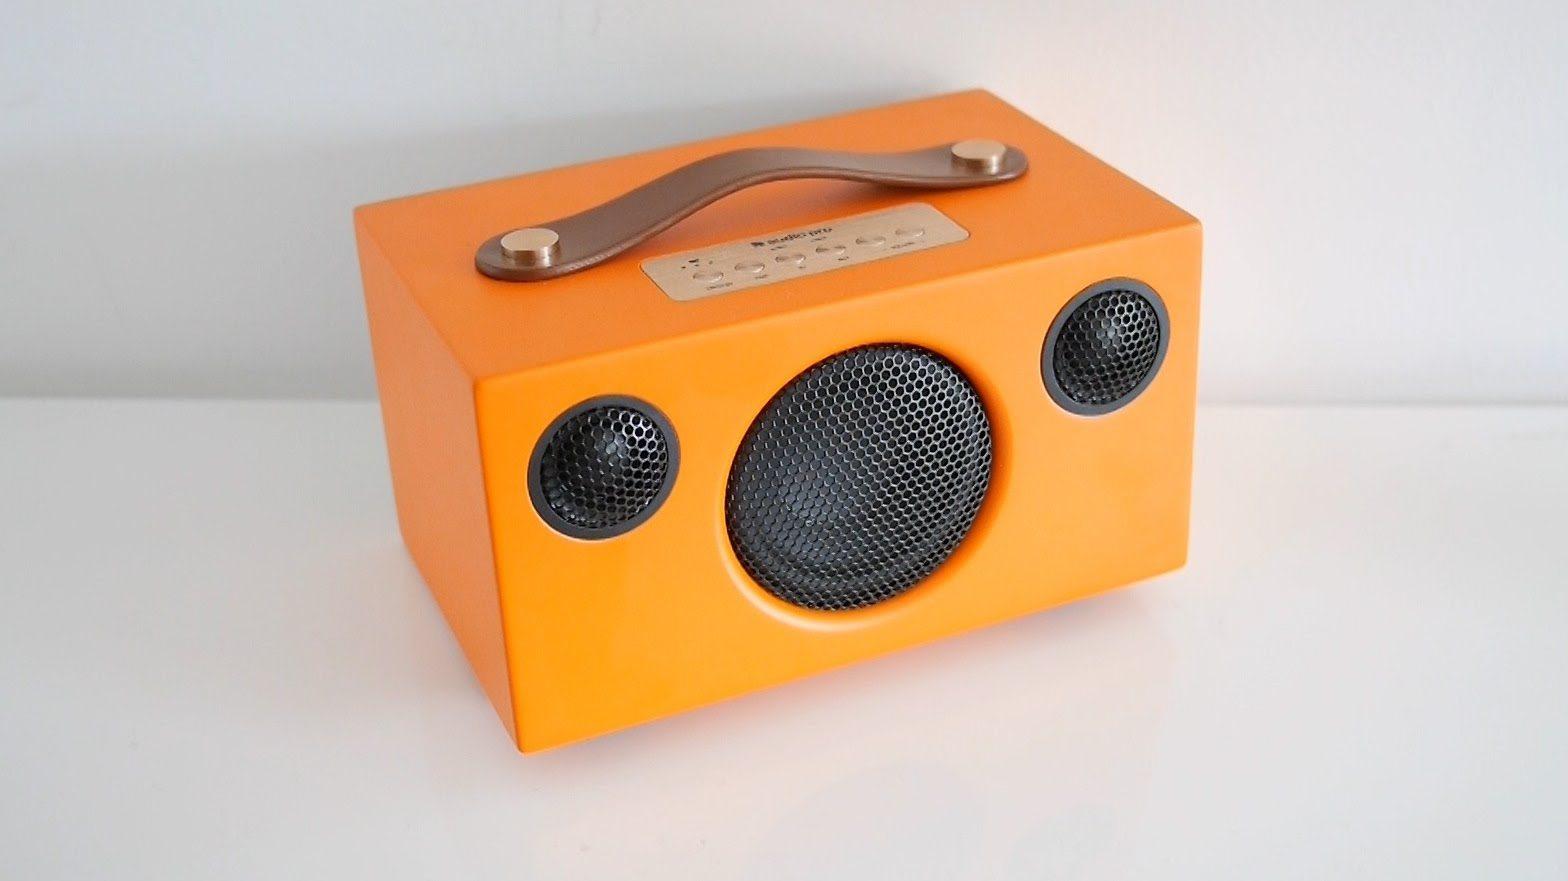 Altavoz portátil Bluetooth. Audio Pro Addon T3